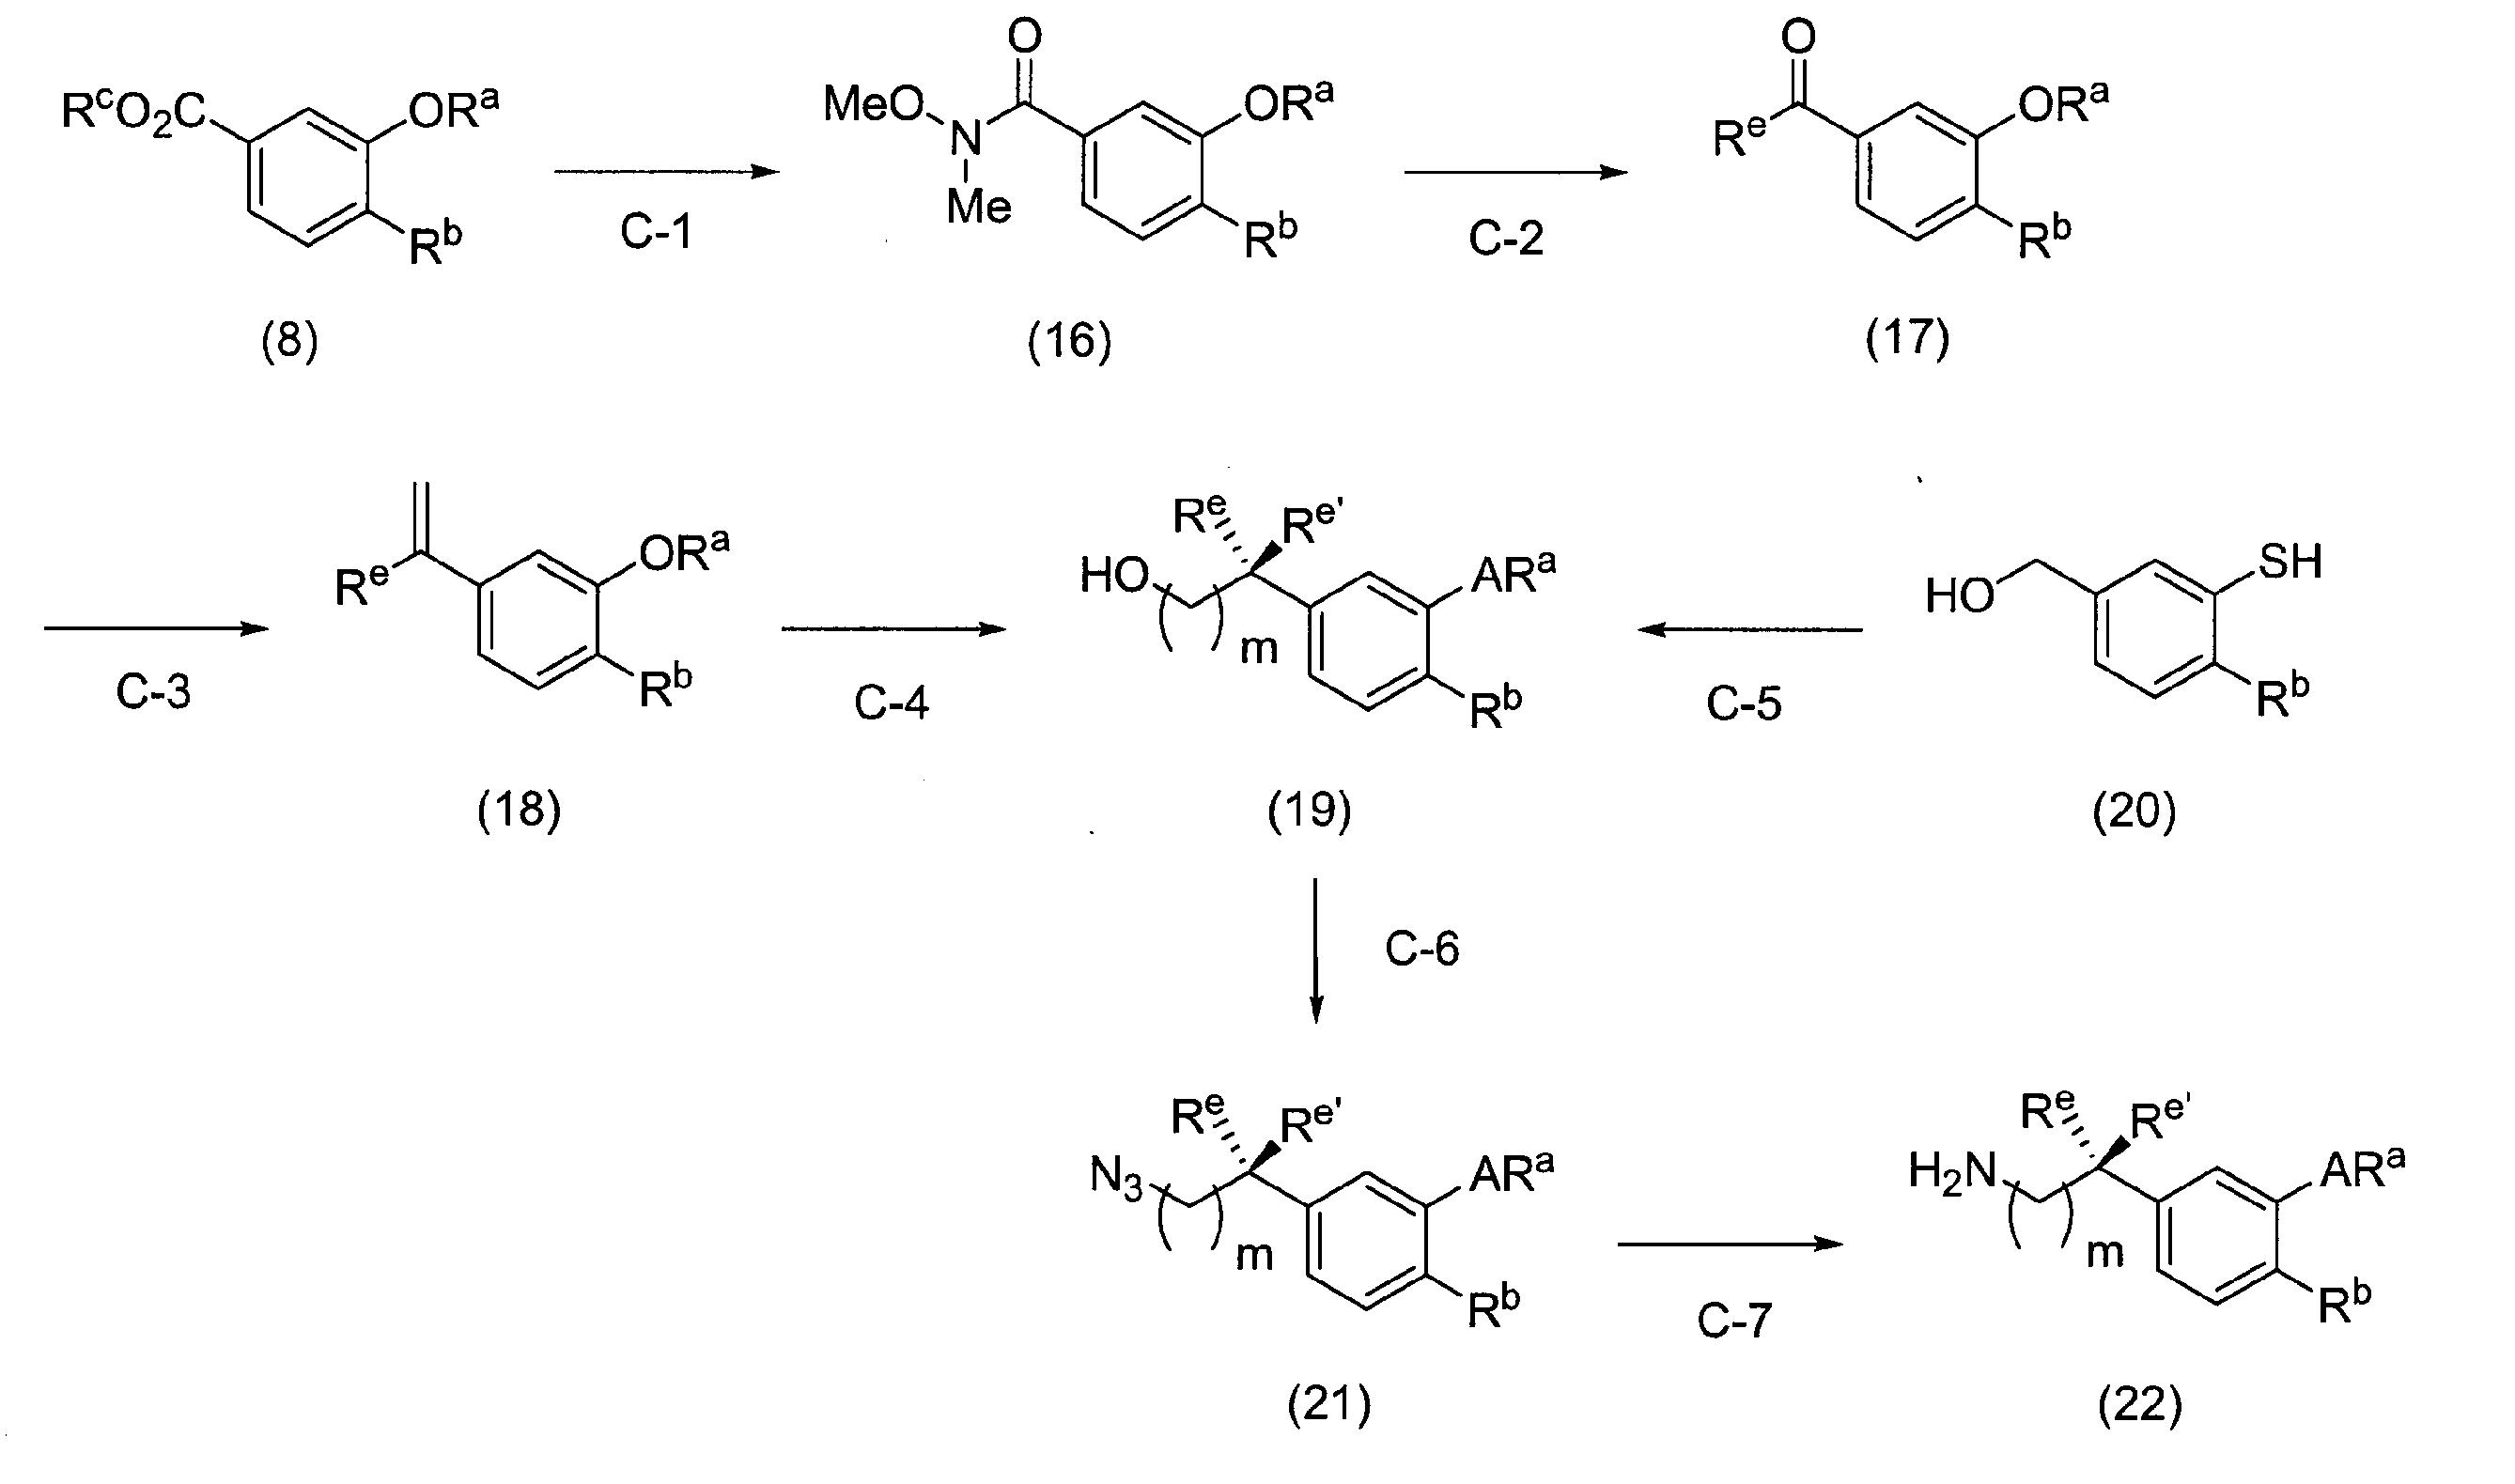 WO2009147843A1 - ヒトデオキシウリジントリホスファターゼ阻害活性を有する新規ウラシル化合物又はその塩         - Google PatentsFamily